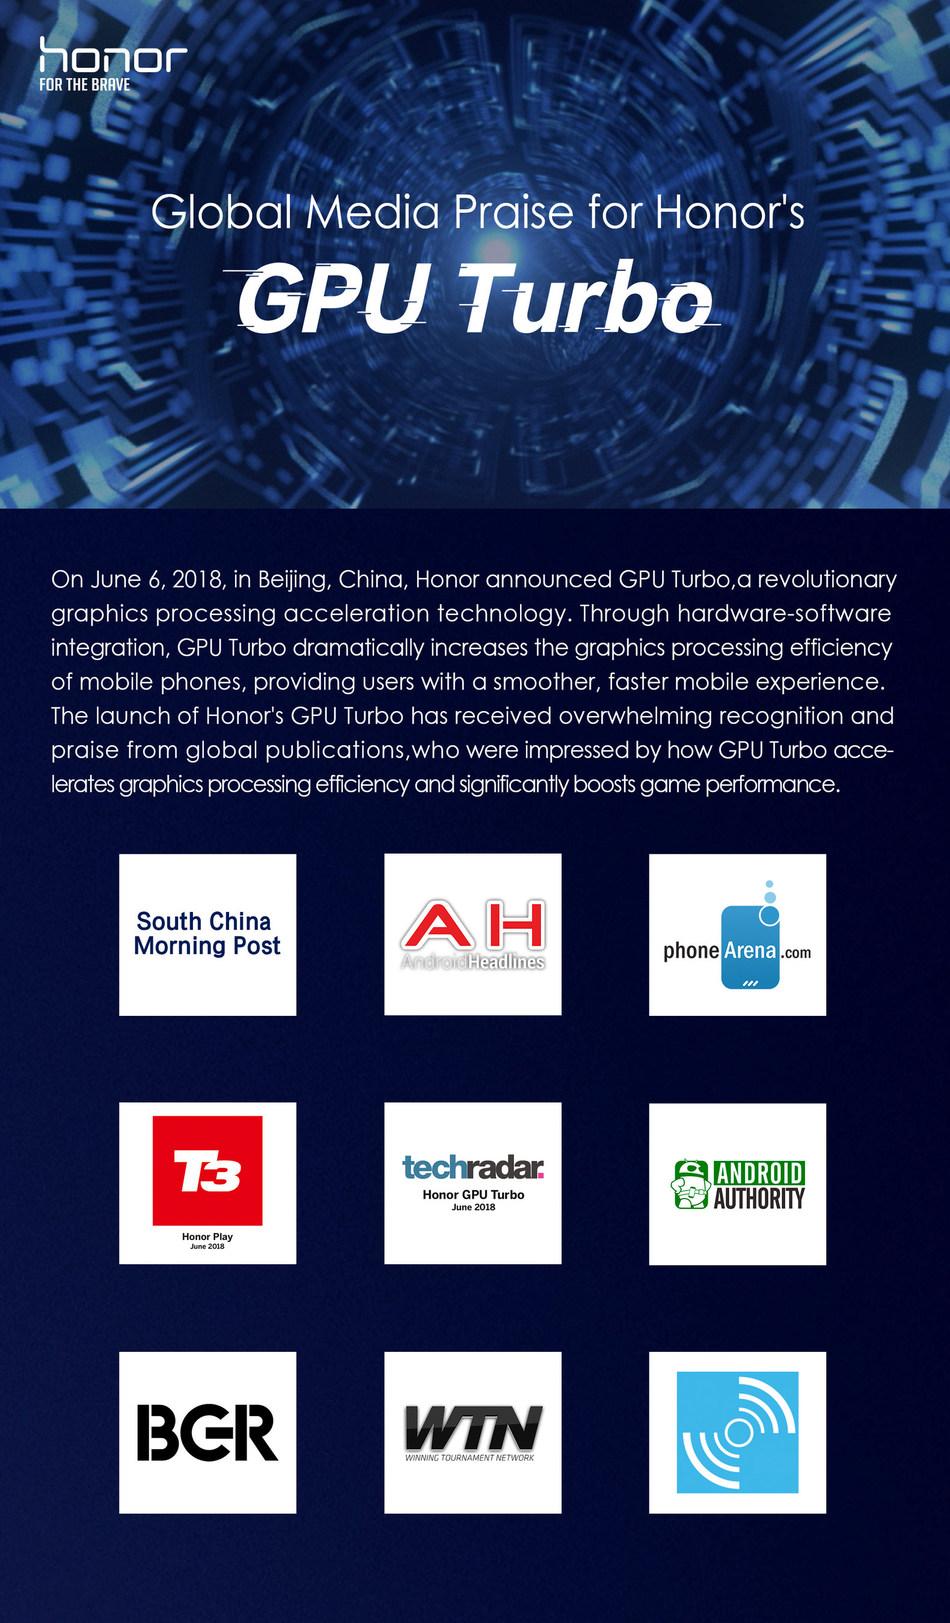 Media Praise for GPU Turbo